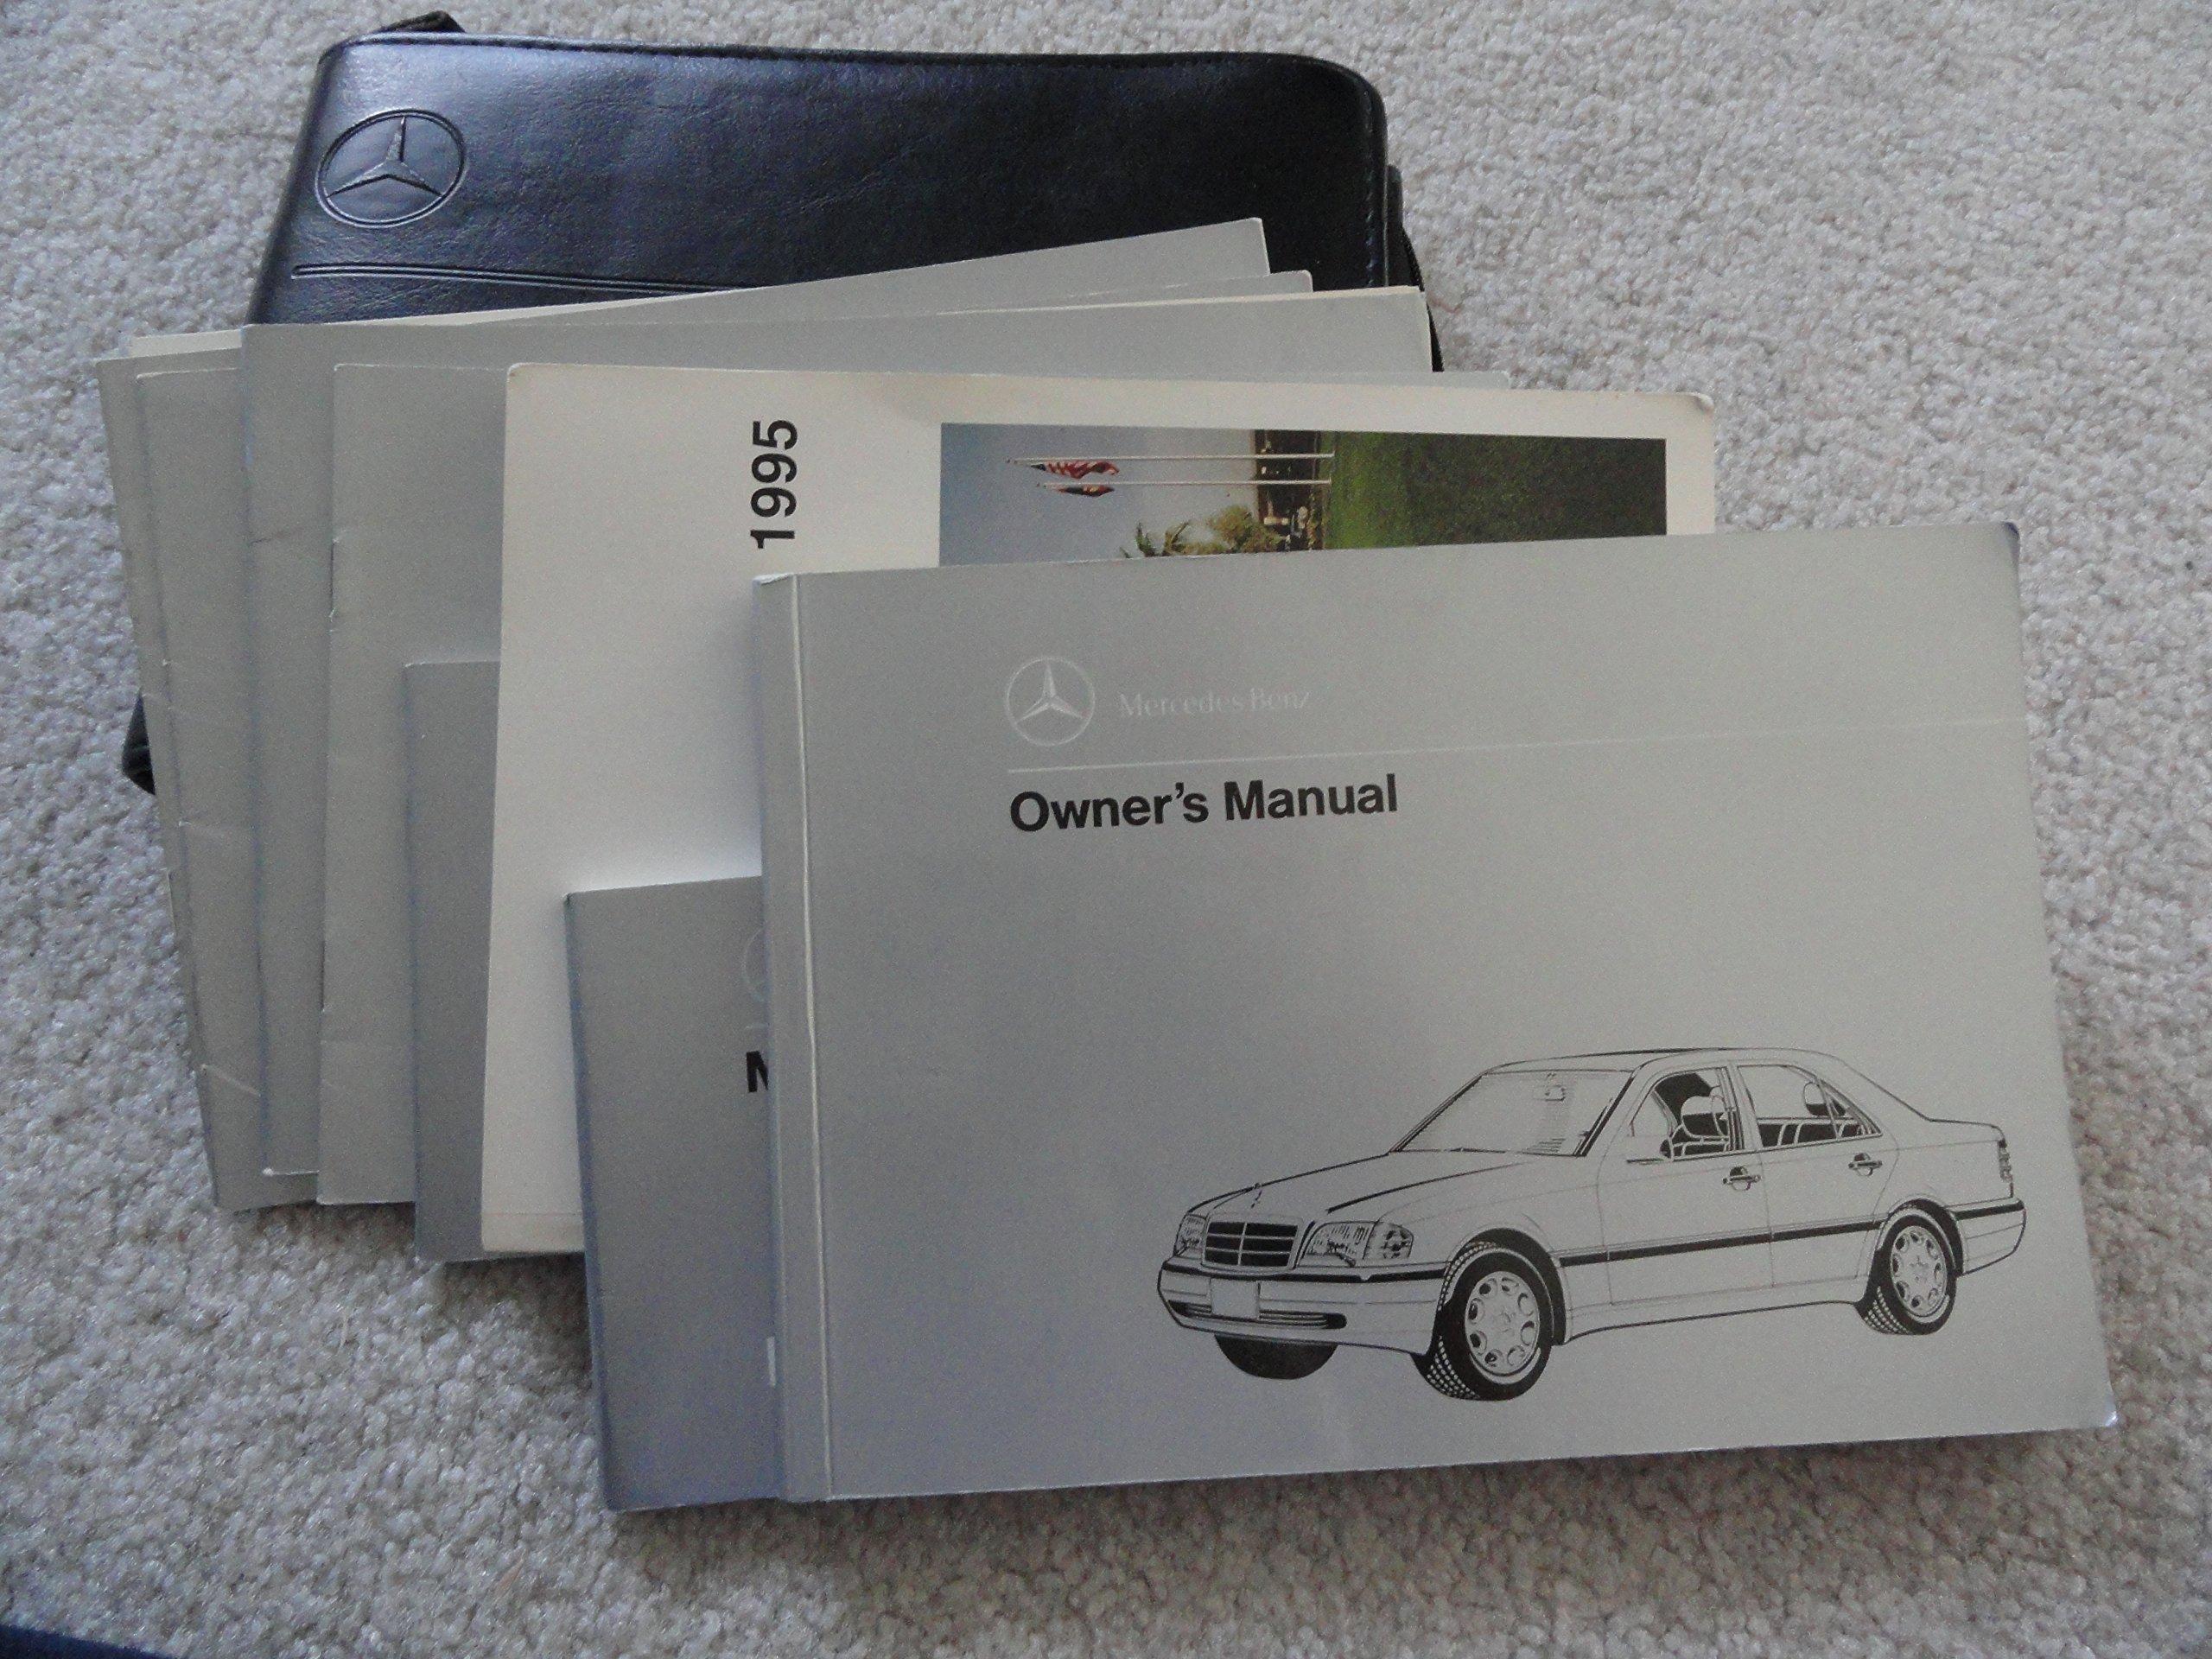 1995 Mercedes Benz C220 C280 C36 AMG Owners Manual: Mercedes Benz:  Amazon.com: Books